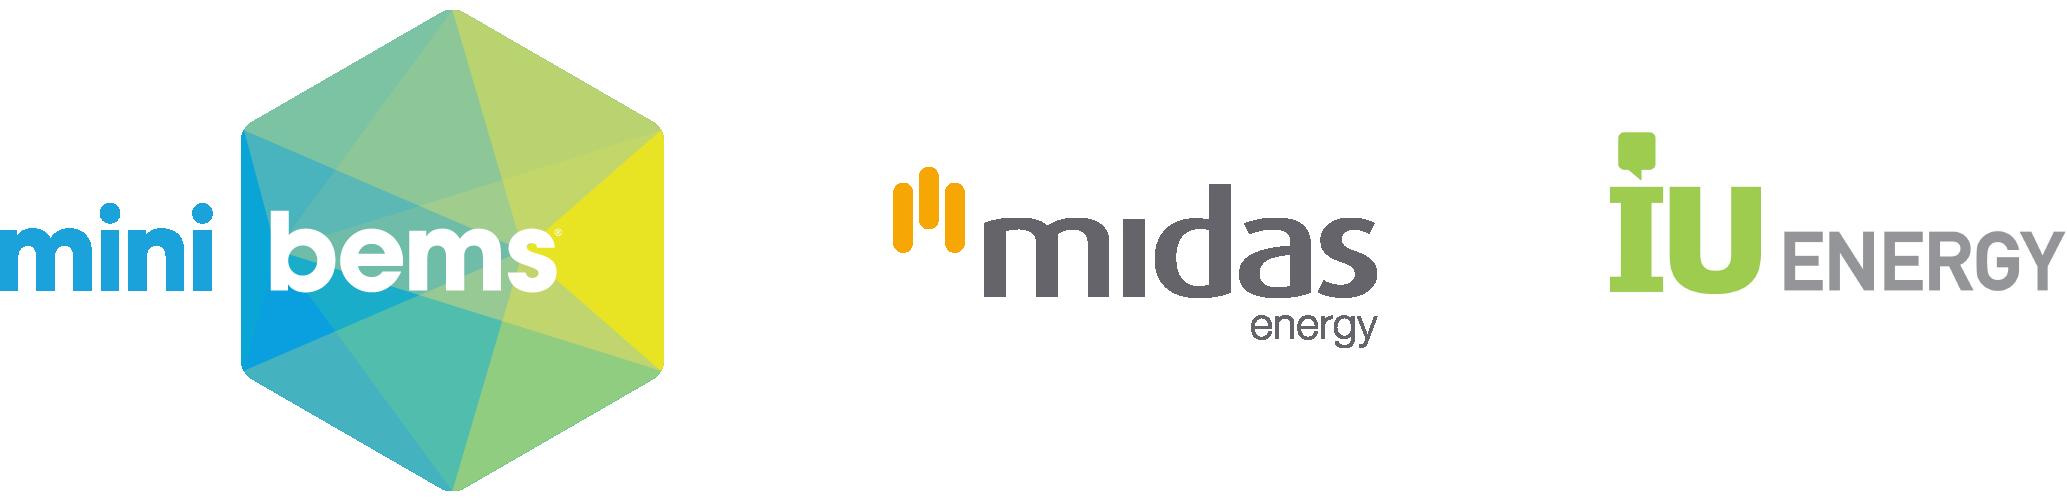 Minibems Midas IU Energy Logos